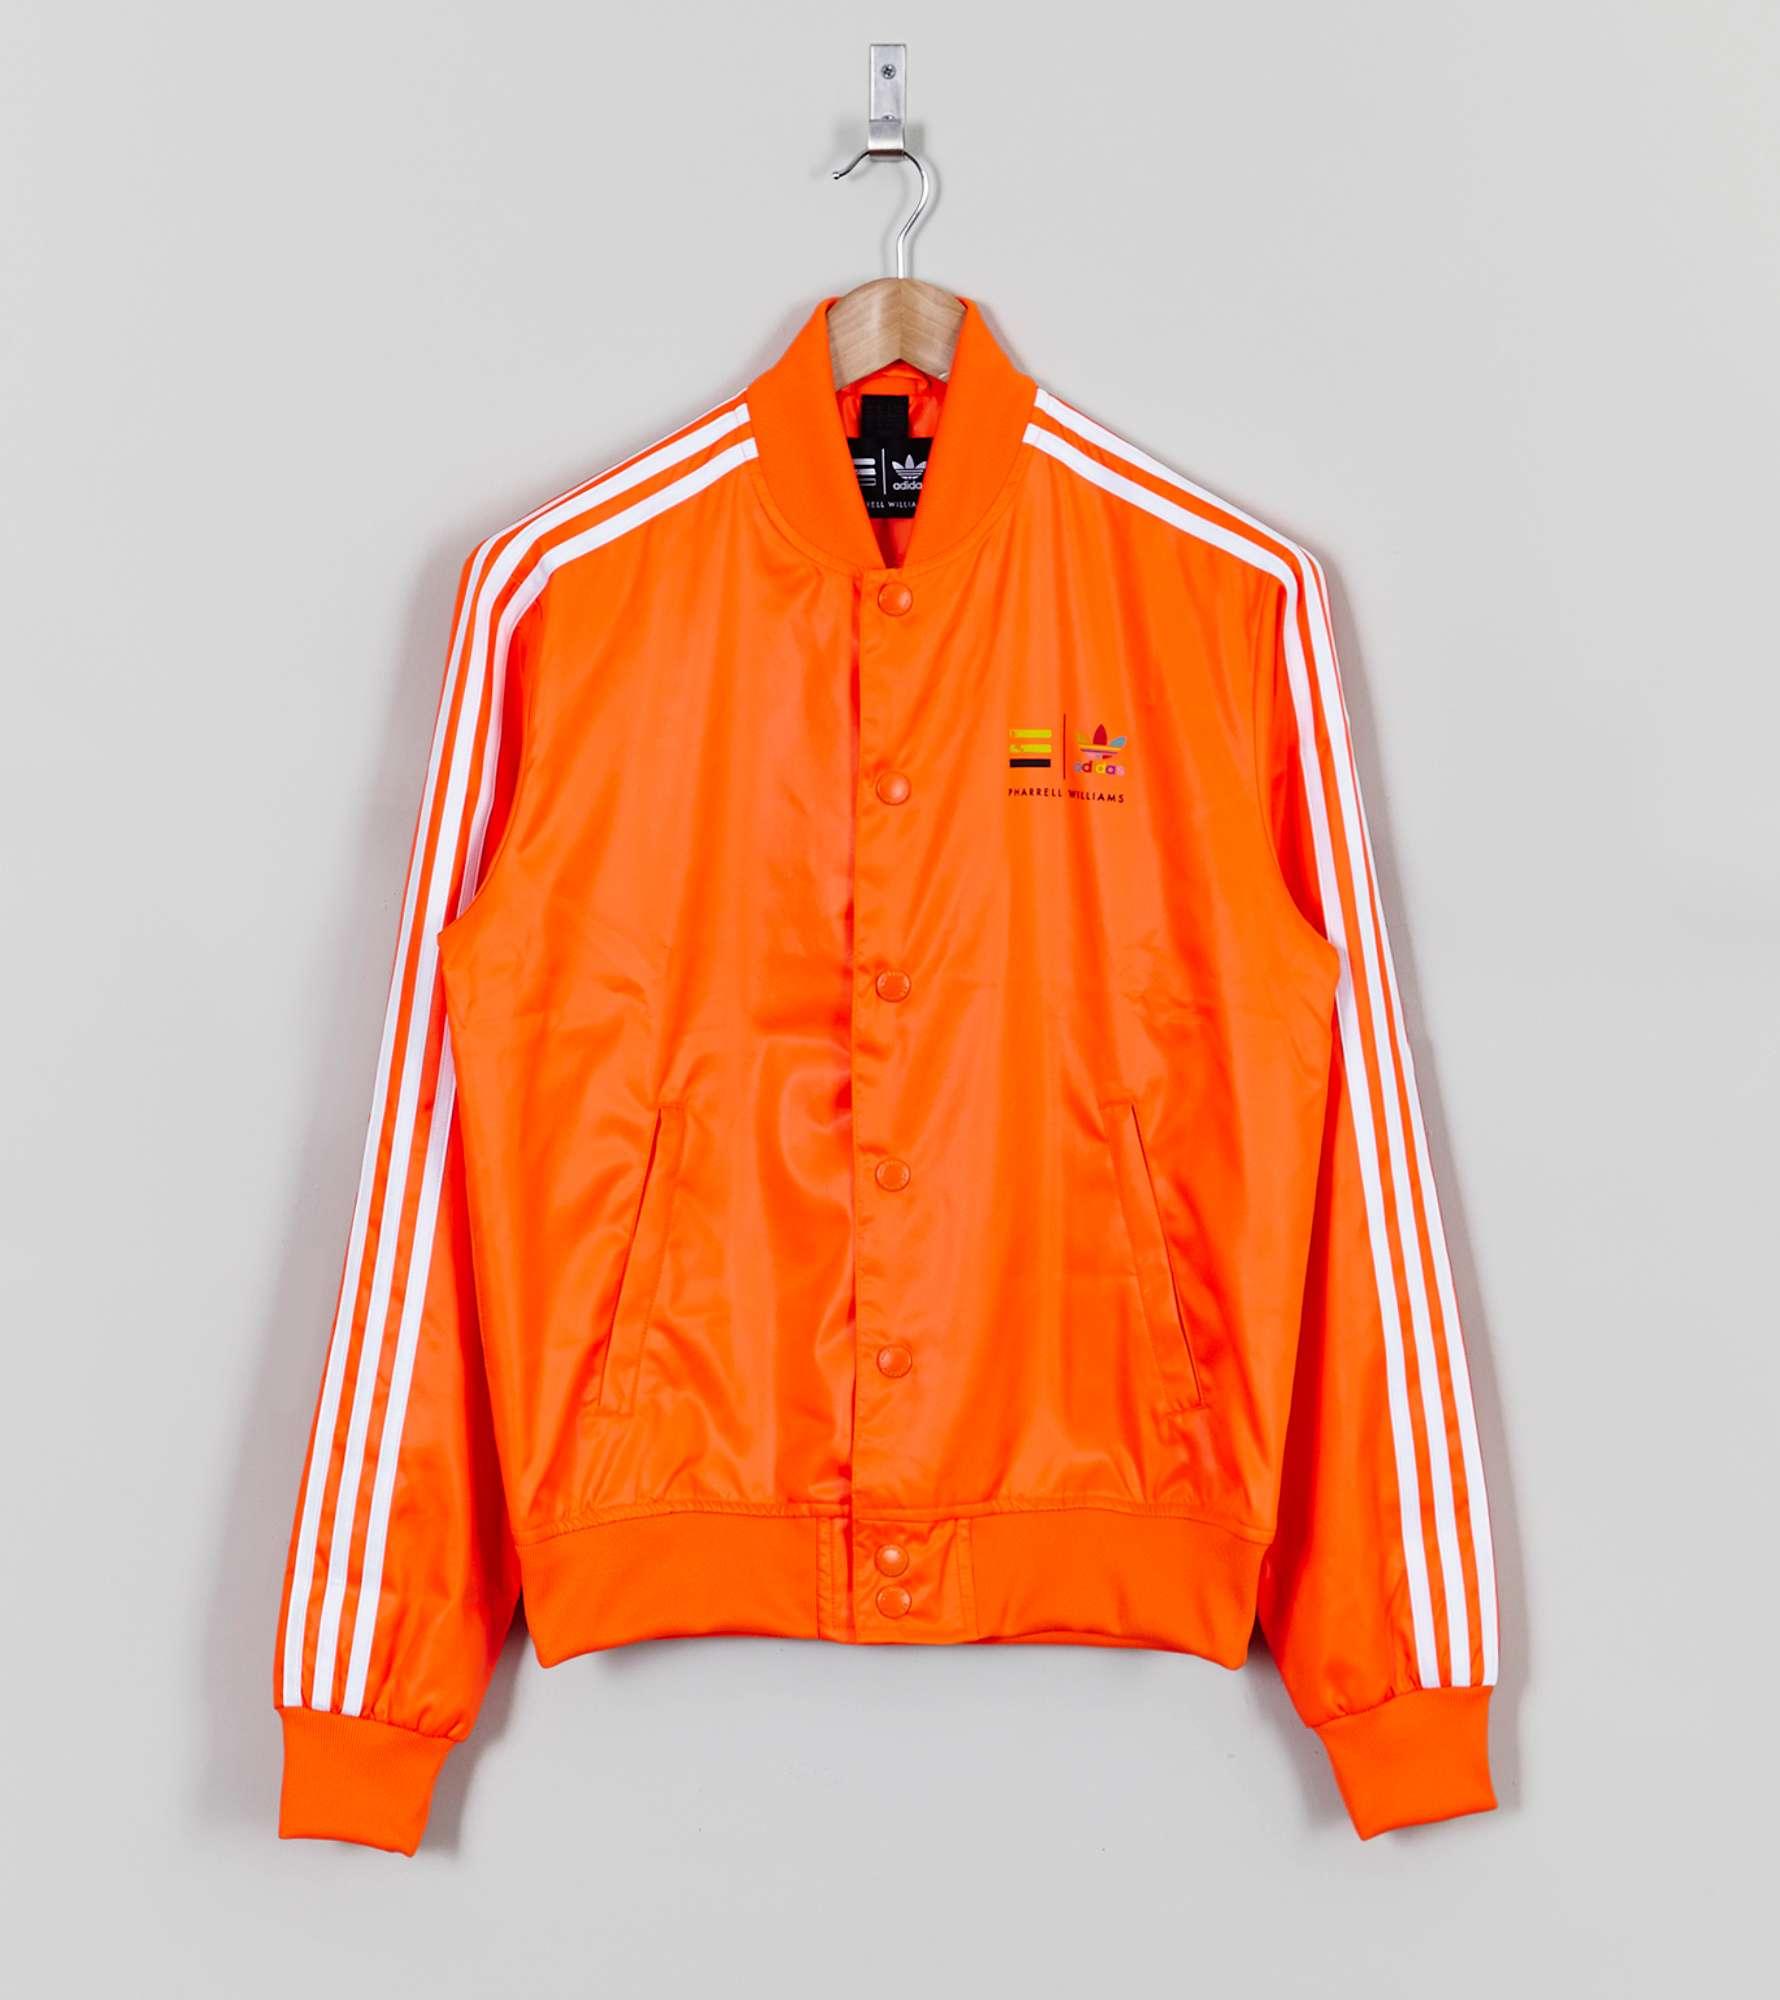 adidas Originals x Pharrell Williams Track Jacket | Size?